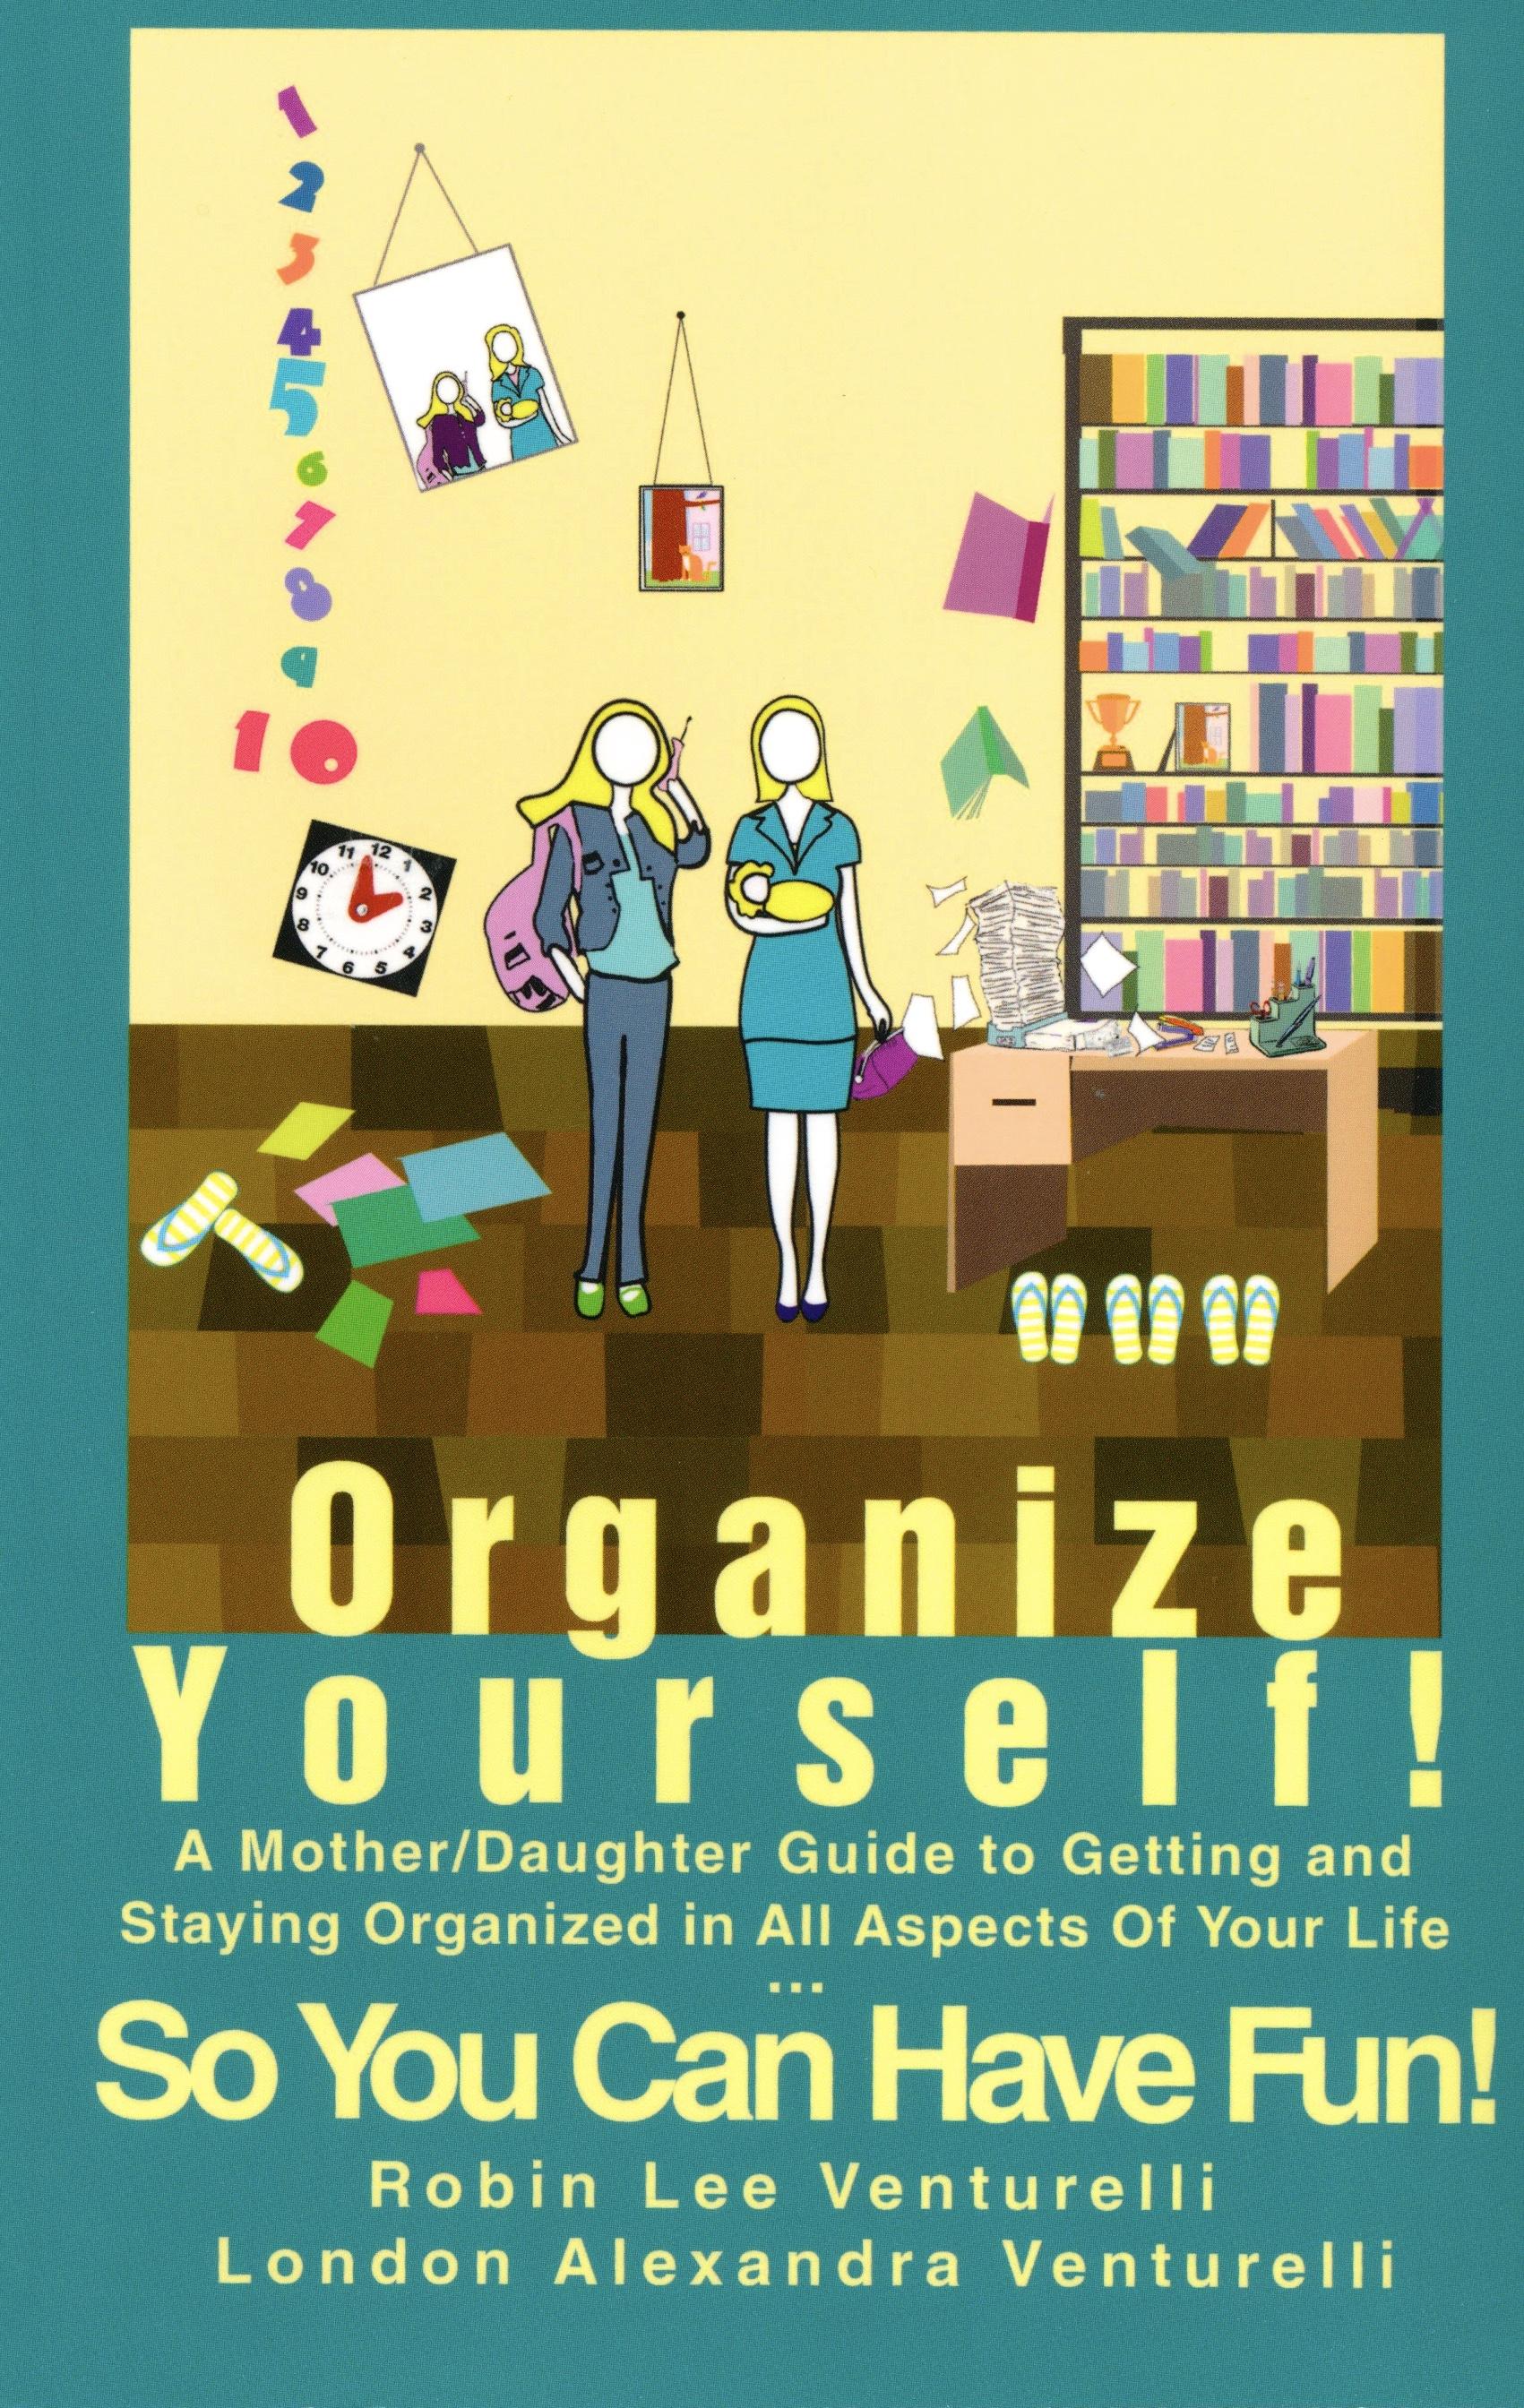 Organize Yourself ! By Robin Venturelli and London Venturelli